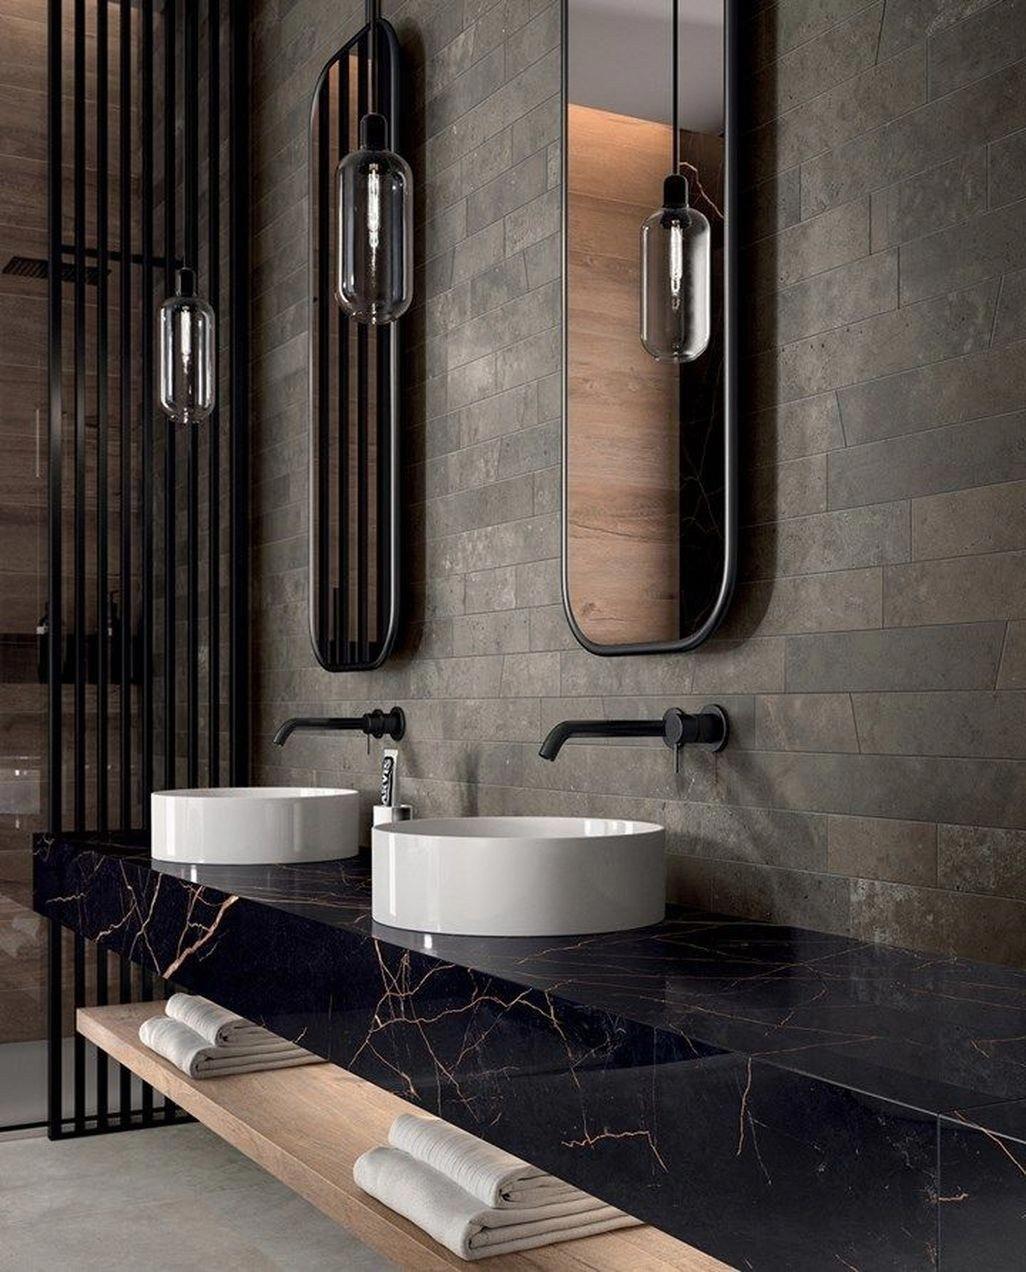 Modern Contemporary Bathroom Design Ideas 10 Modernhomedecorbathroom Modern Contemporary Bathrooms Contemporary Bathroom Designs Modern Bathroom Design